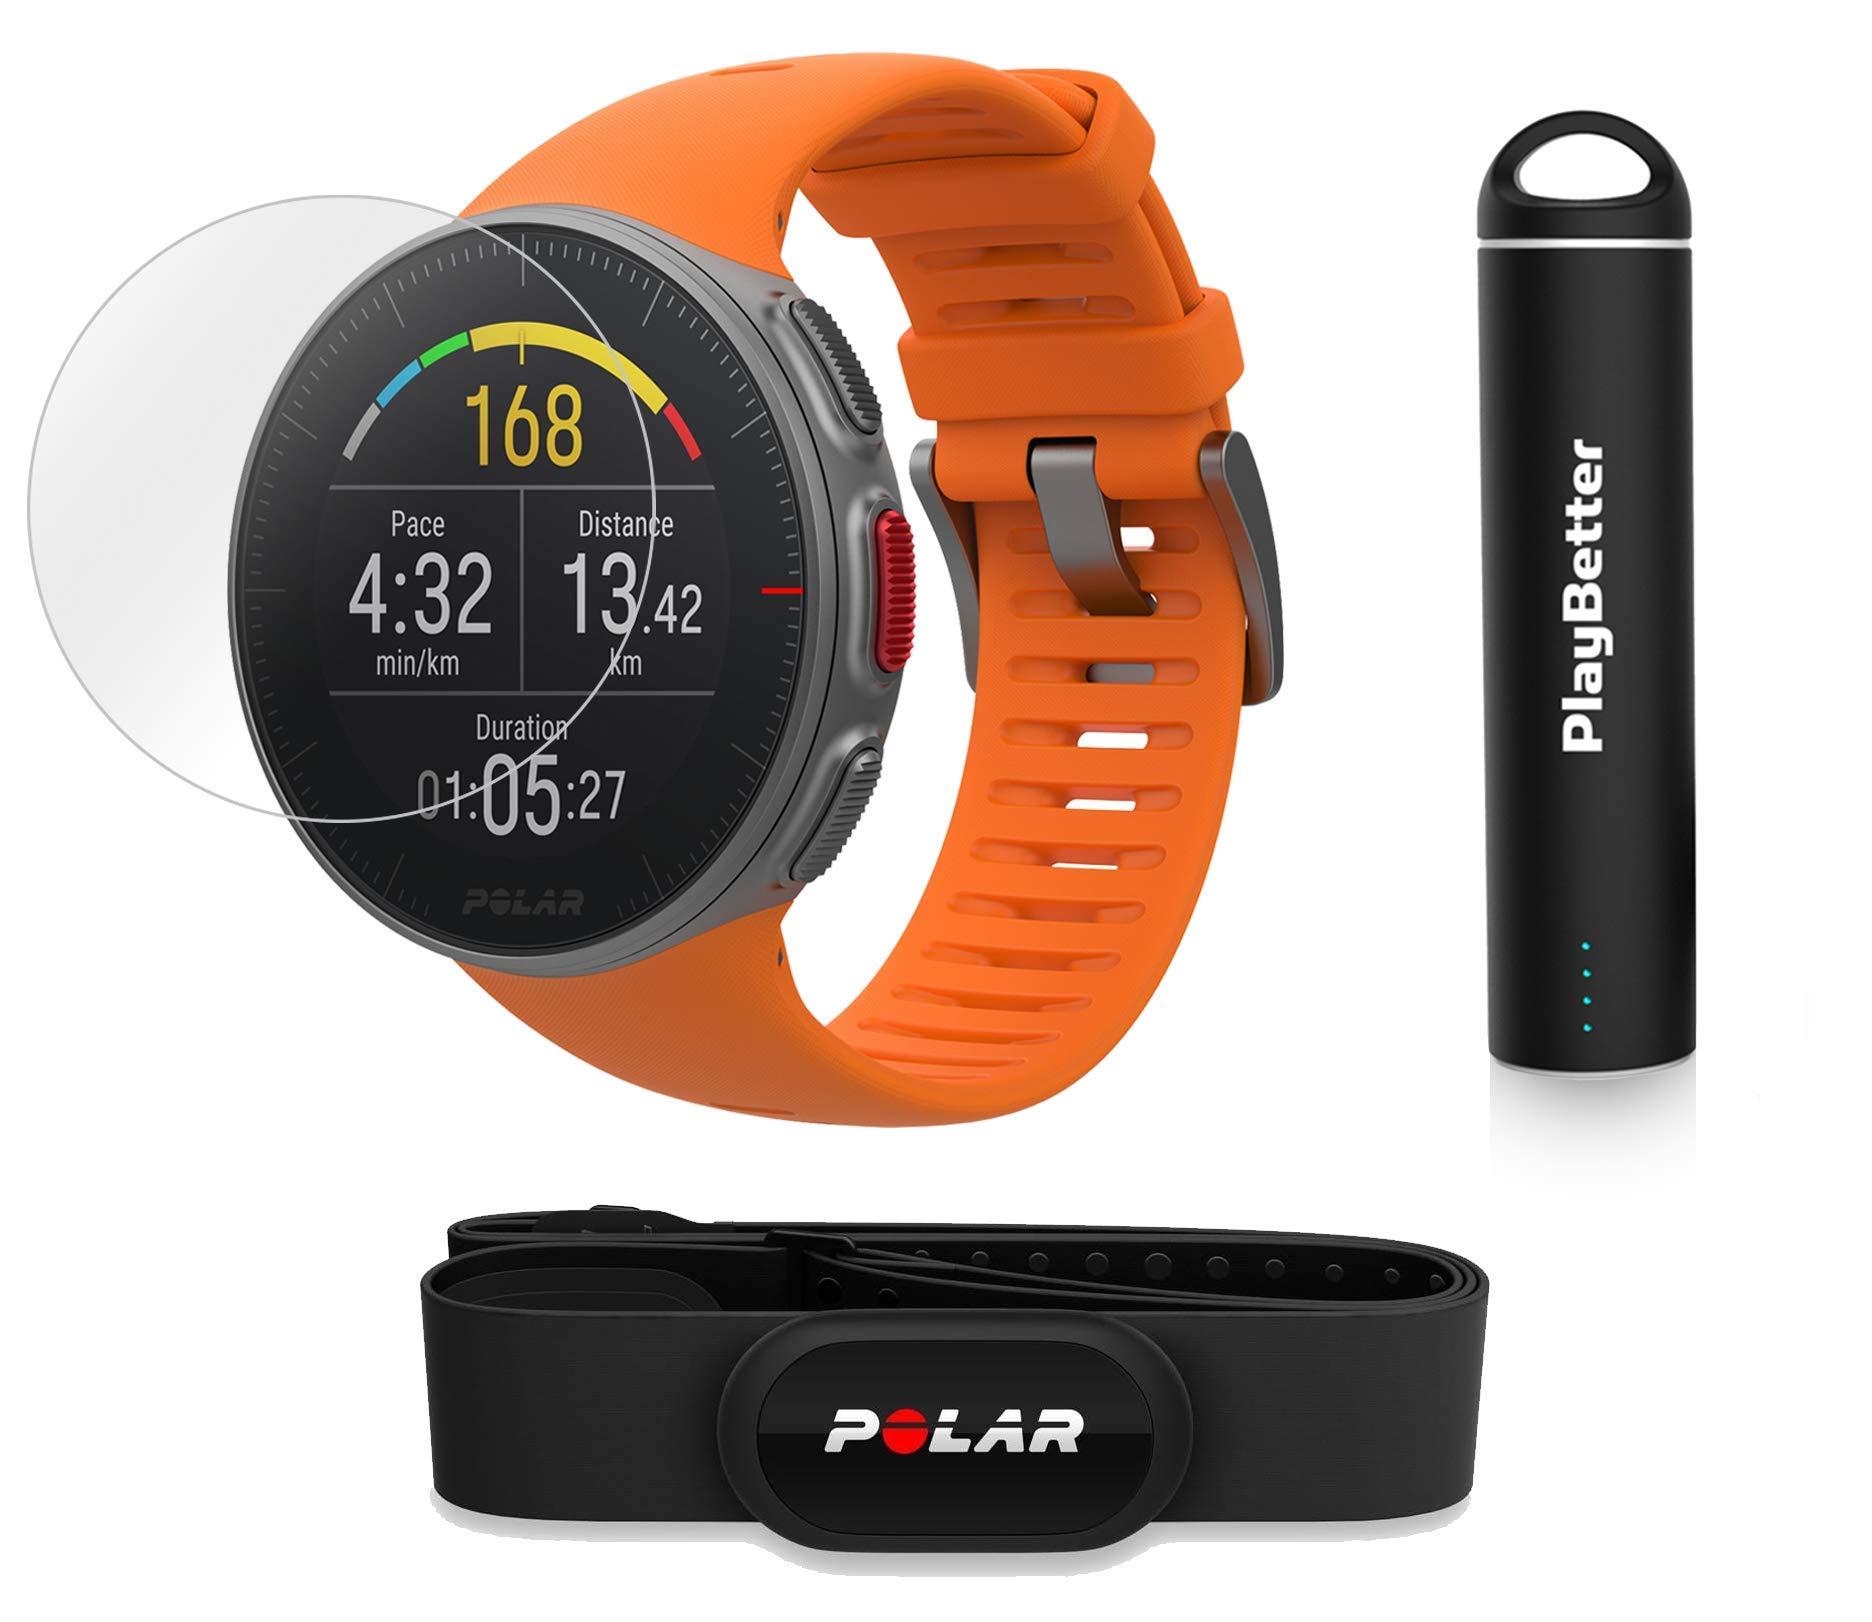 PlayBetter Polar Vantage V Pro (Orange with H10 Heart Rate Sensor) Power Bundle Portable Charger & Screen Protectors | Multisport Watch | GPS & Barometer